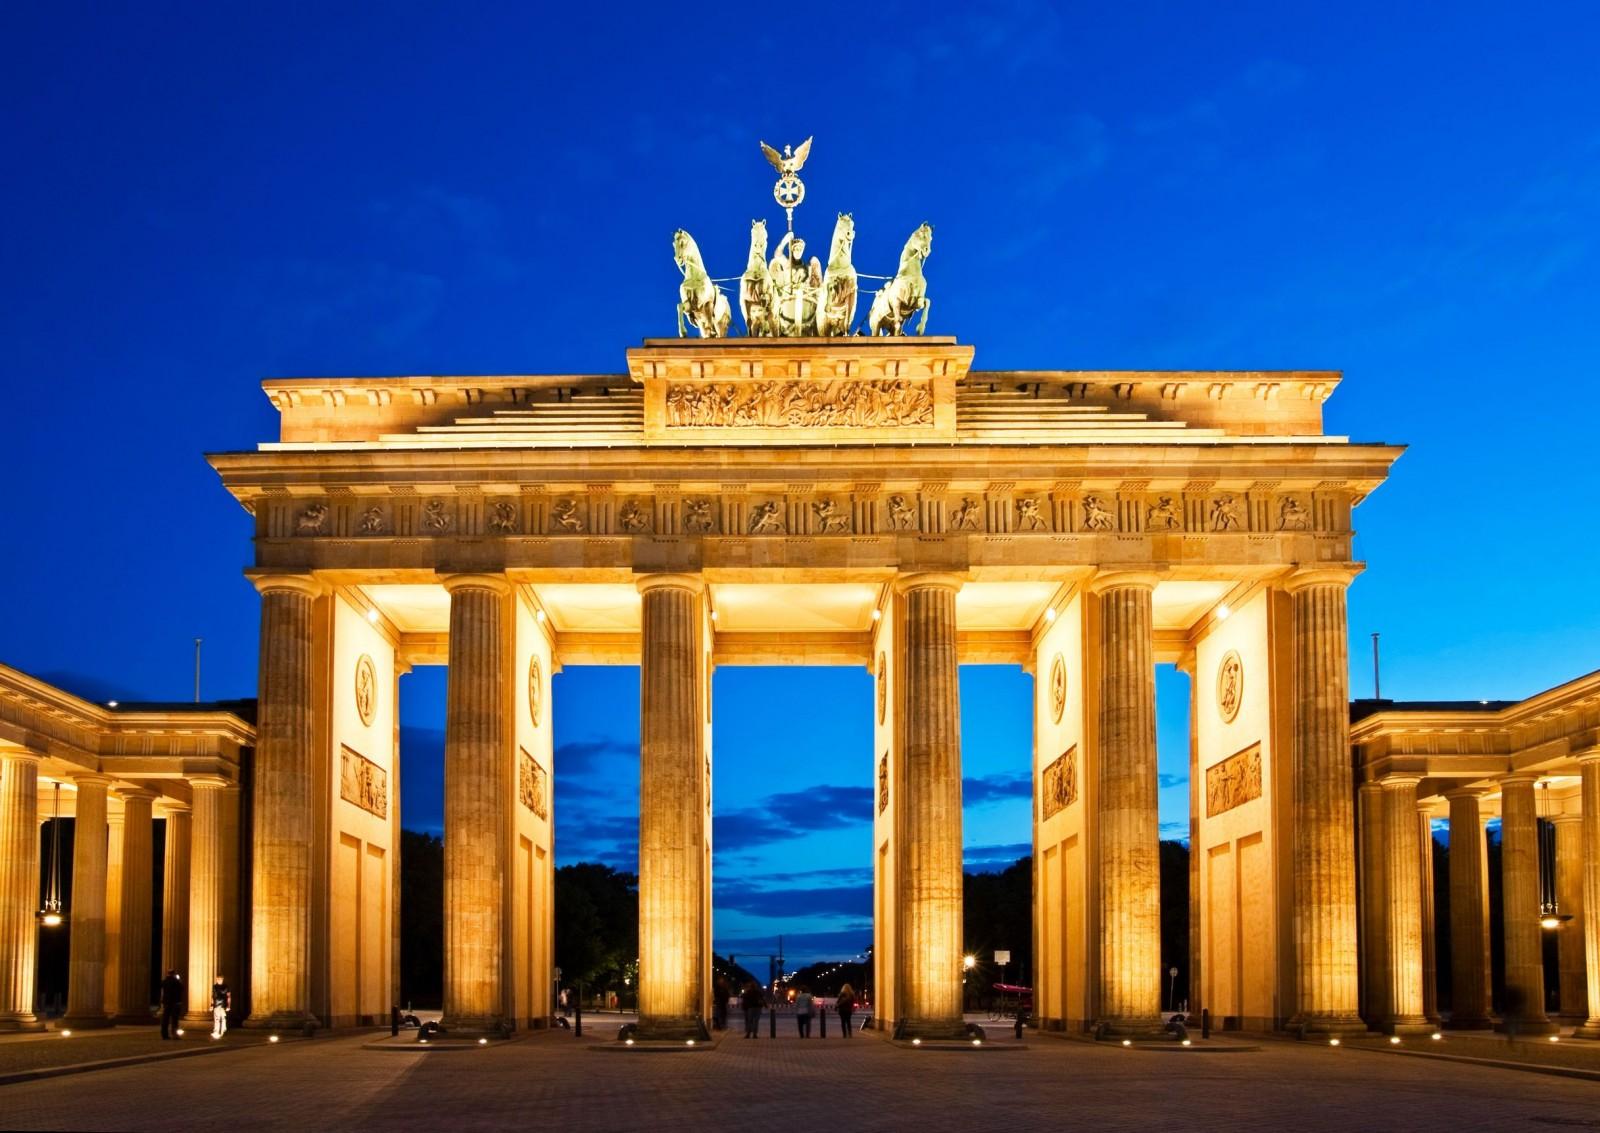 Brandenburg Gate Backgrounds Travelling Gallery 1600x1133